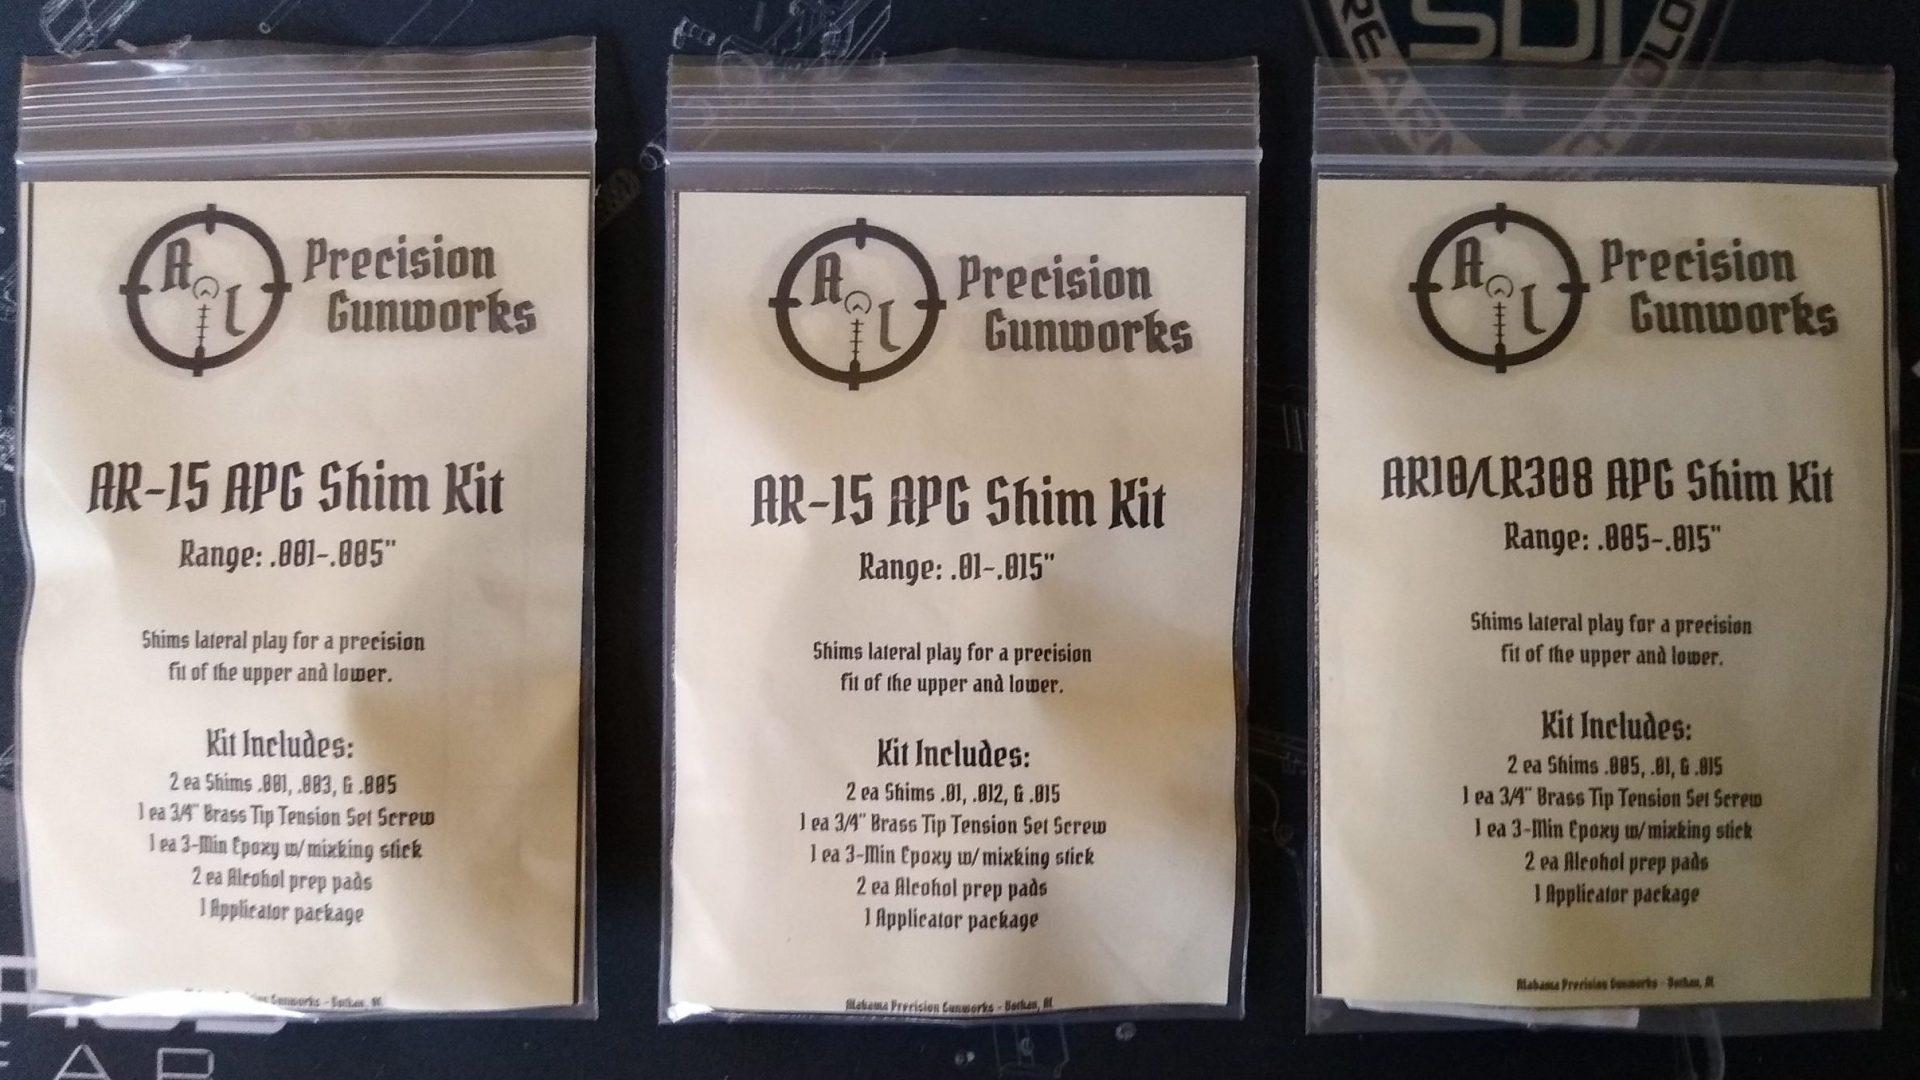 Alabama Precision Gunworks